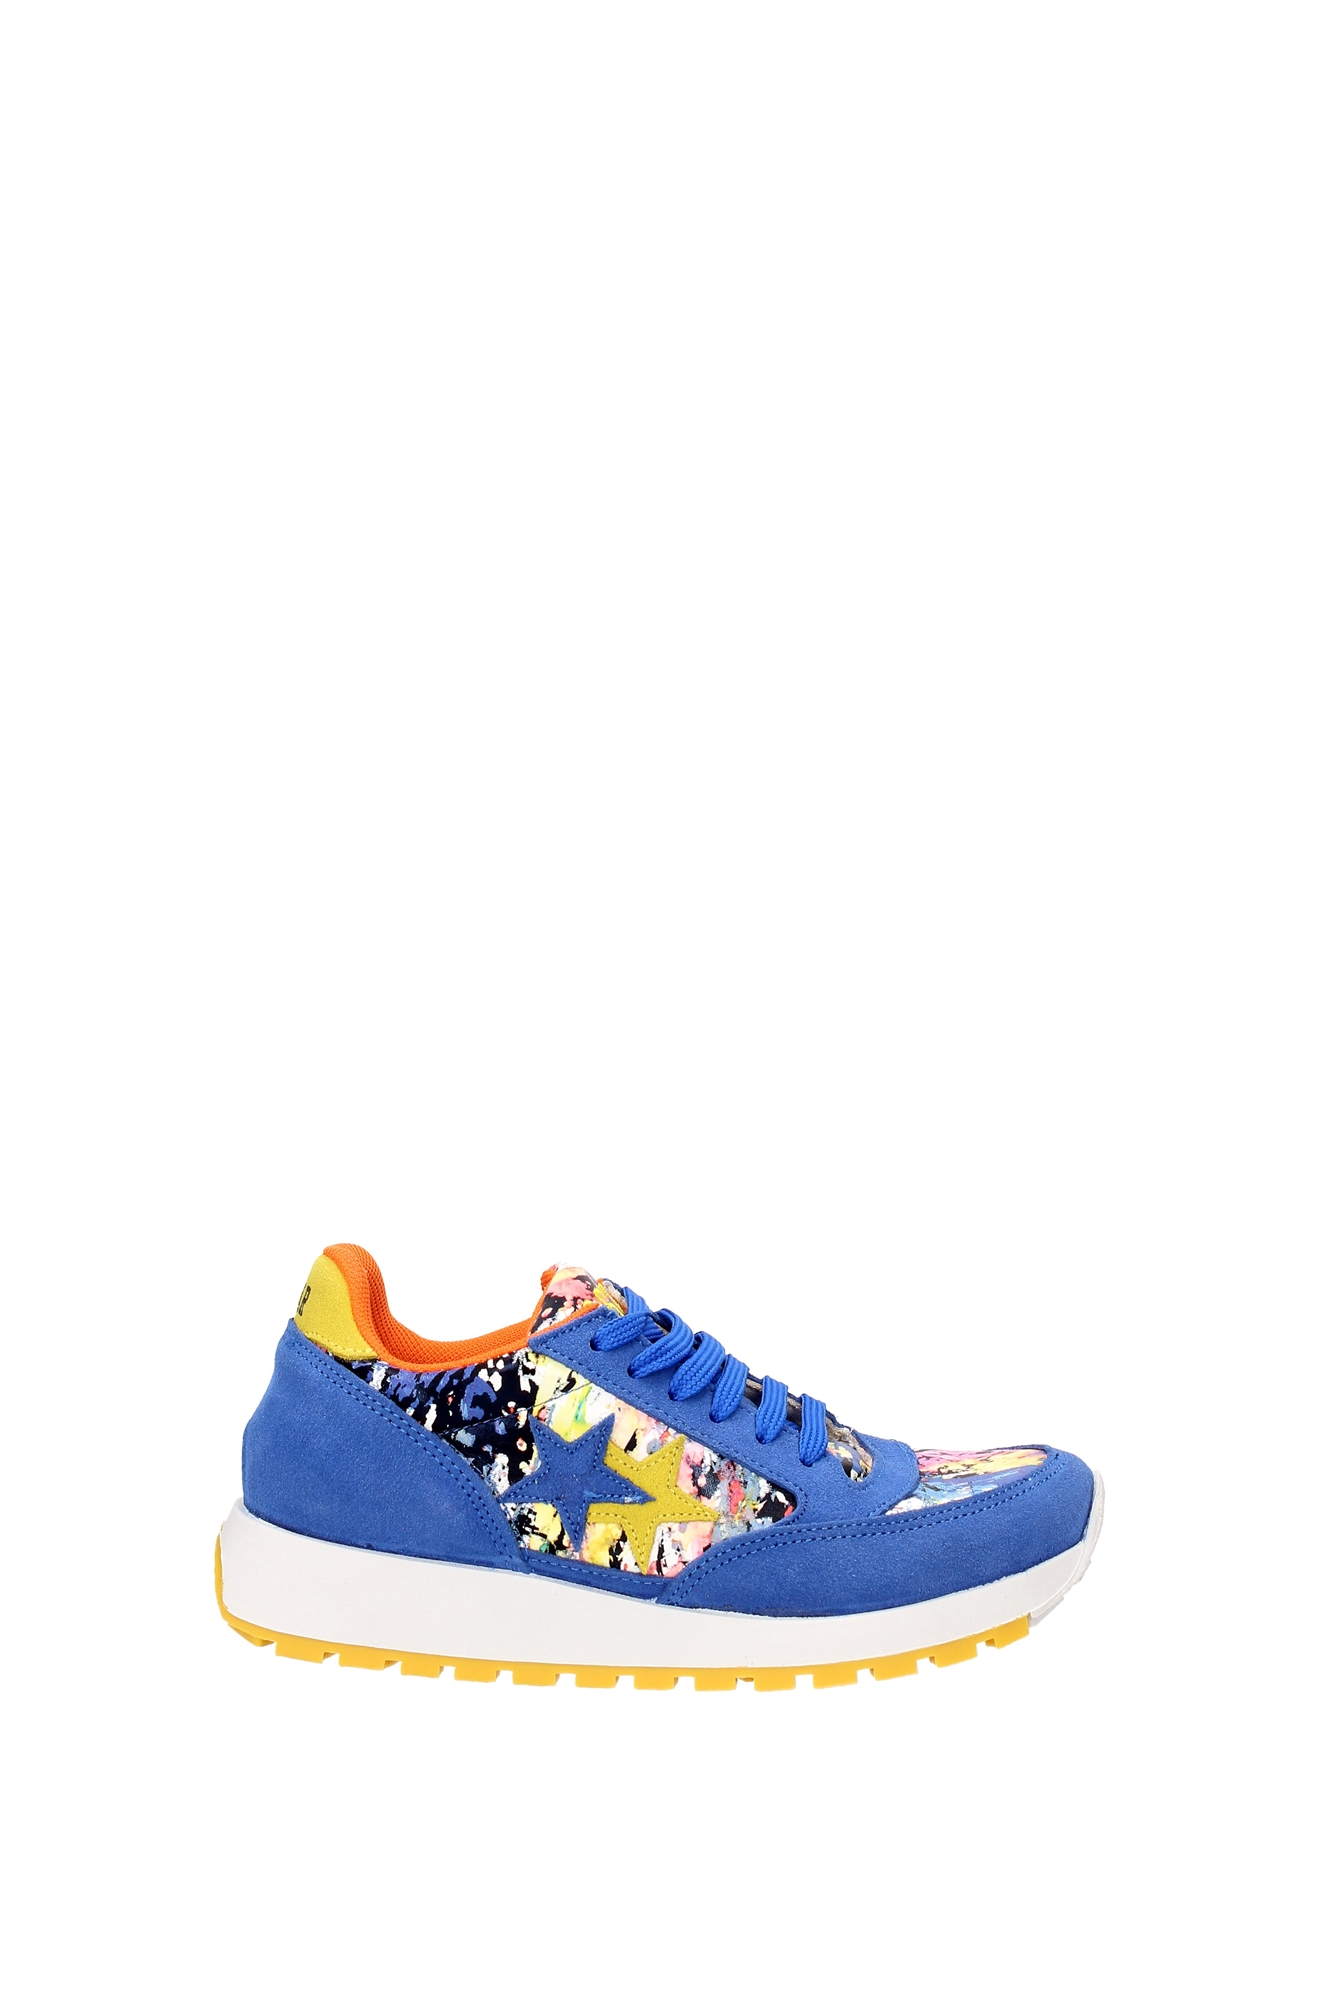 Sneakers 2star Damenschuhe -  (2SD1155FANTASIA)